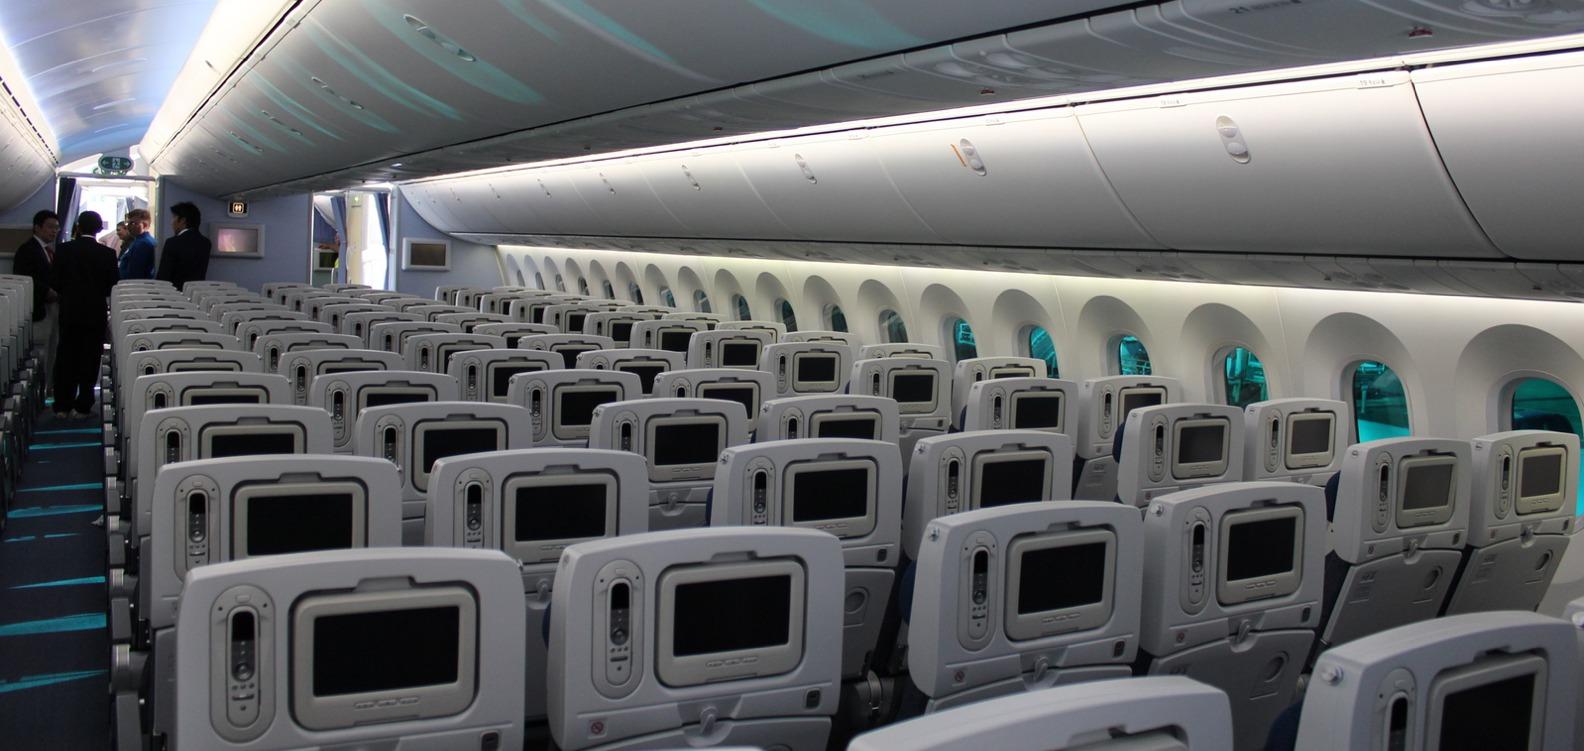 Android embarque dans les boeing 787 dreamliner geekattitude for Interieur 747